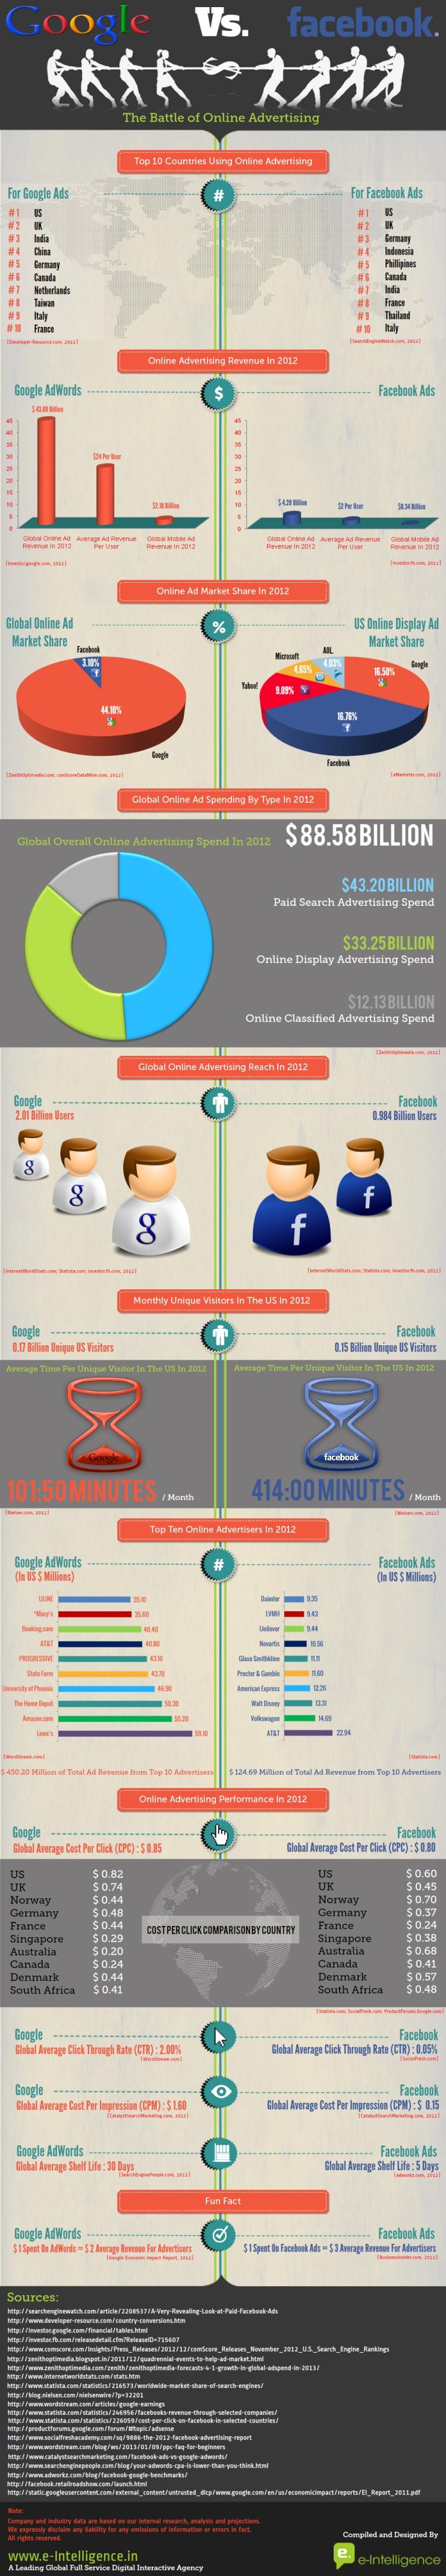 Google VS Facebook advertisements